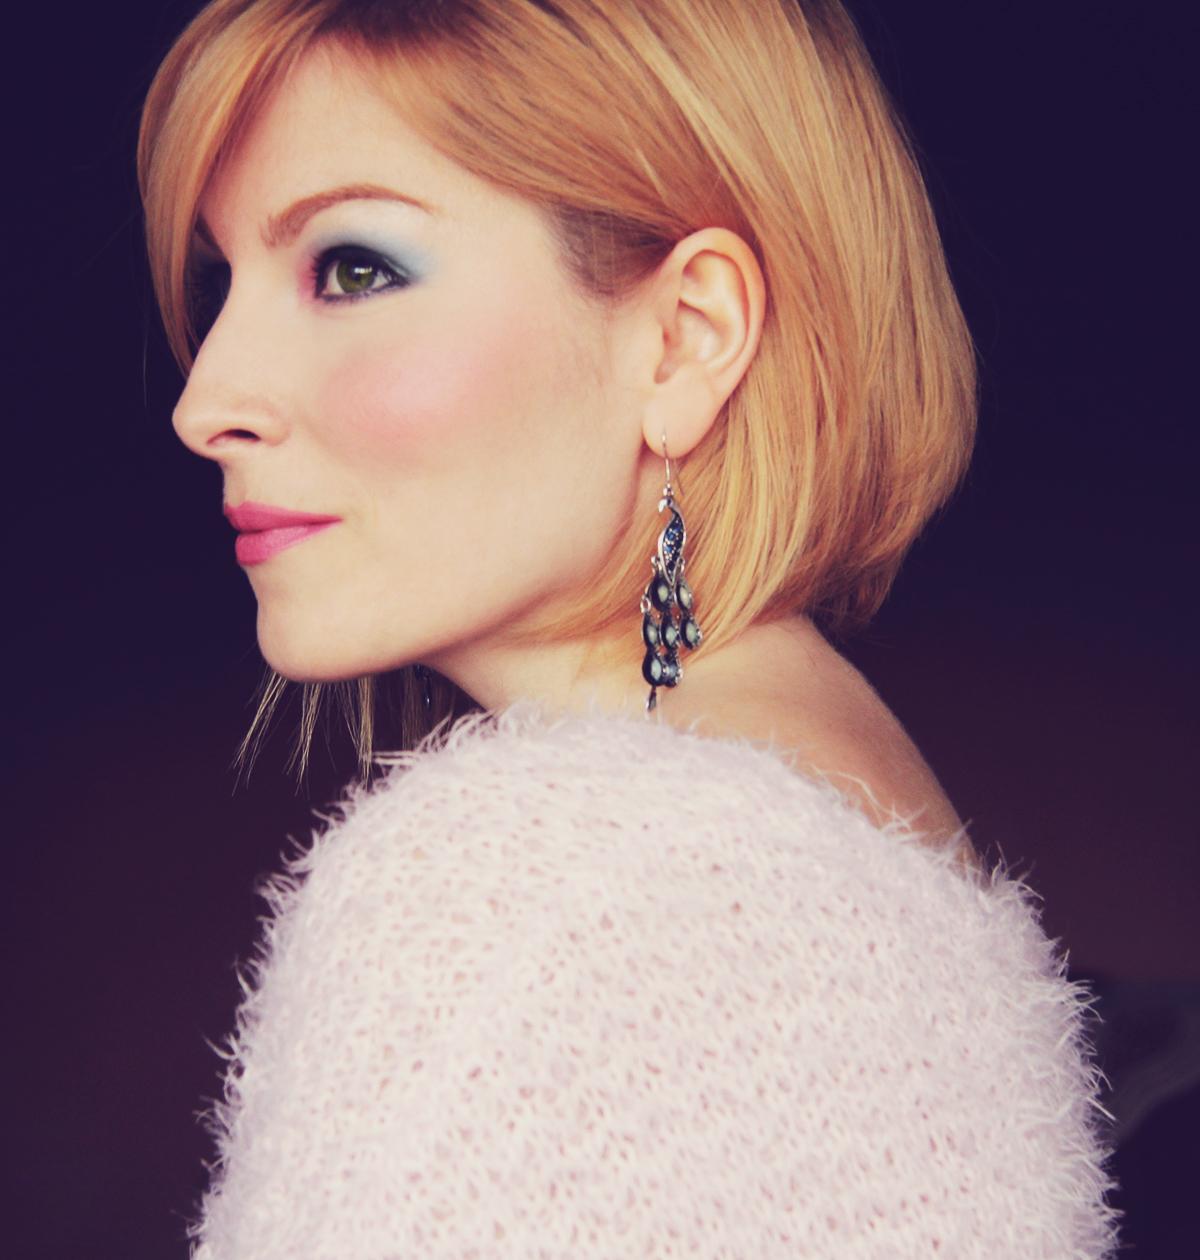 rose quartz and serenity make-up_profile view